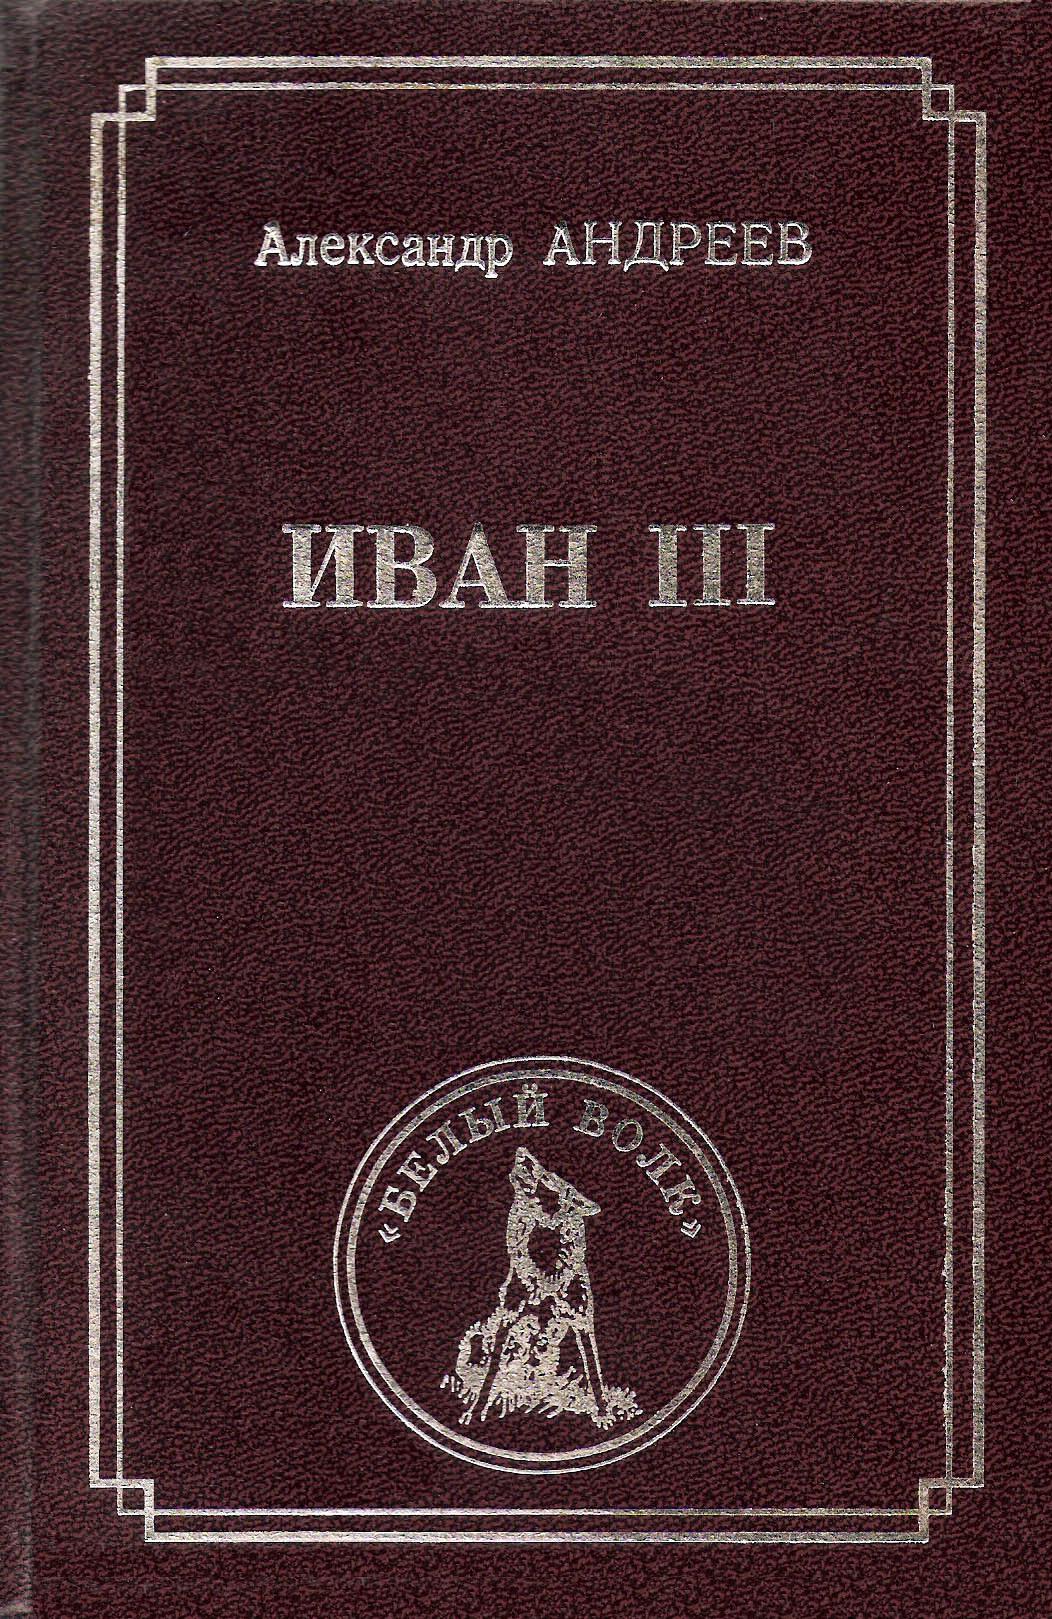 Александр Андреев Иван III александр андреев иван iii isbn 5 93442 003 4